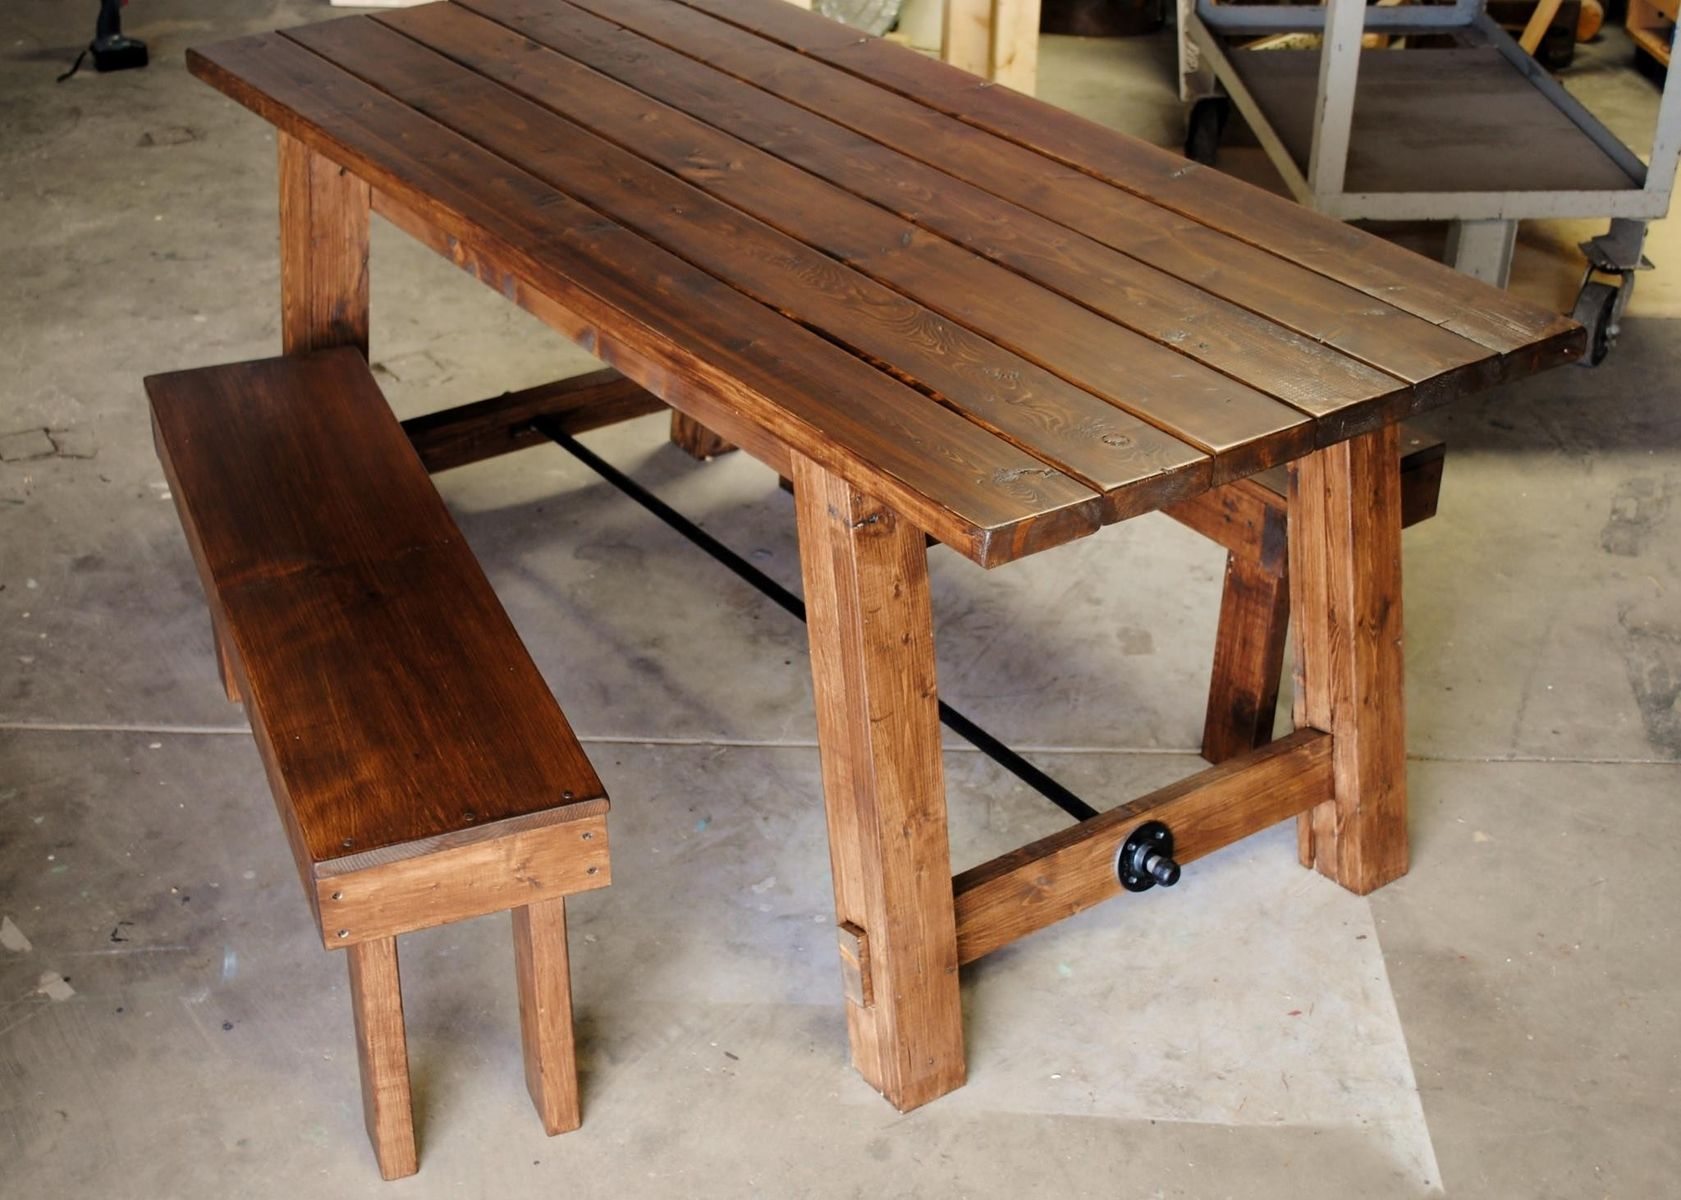 Custom Made Farmhouse Table   Could I Make Something Like This?? Custommade .com